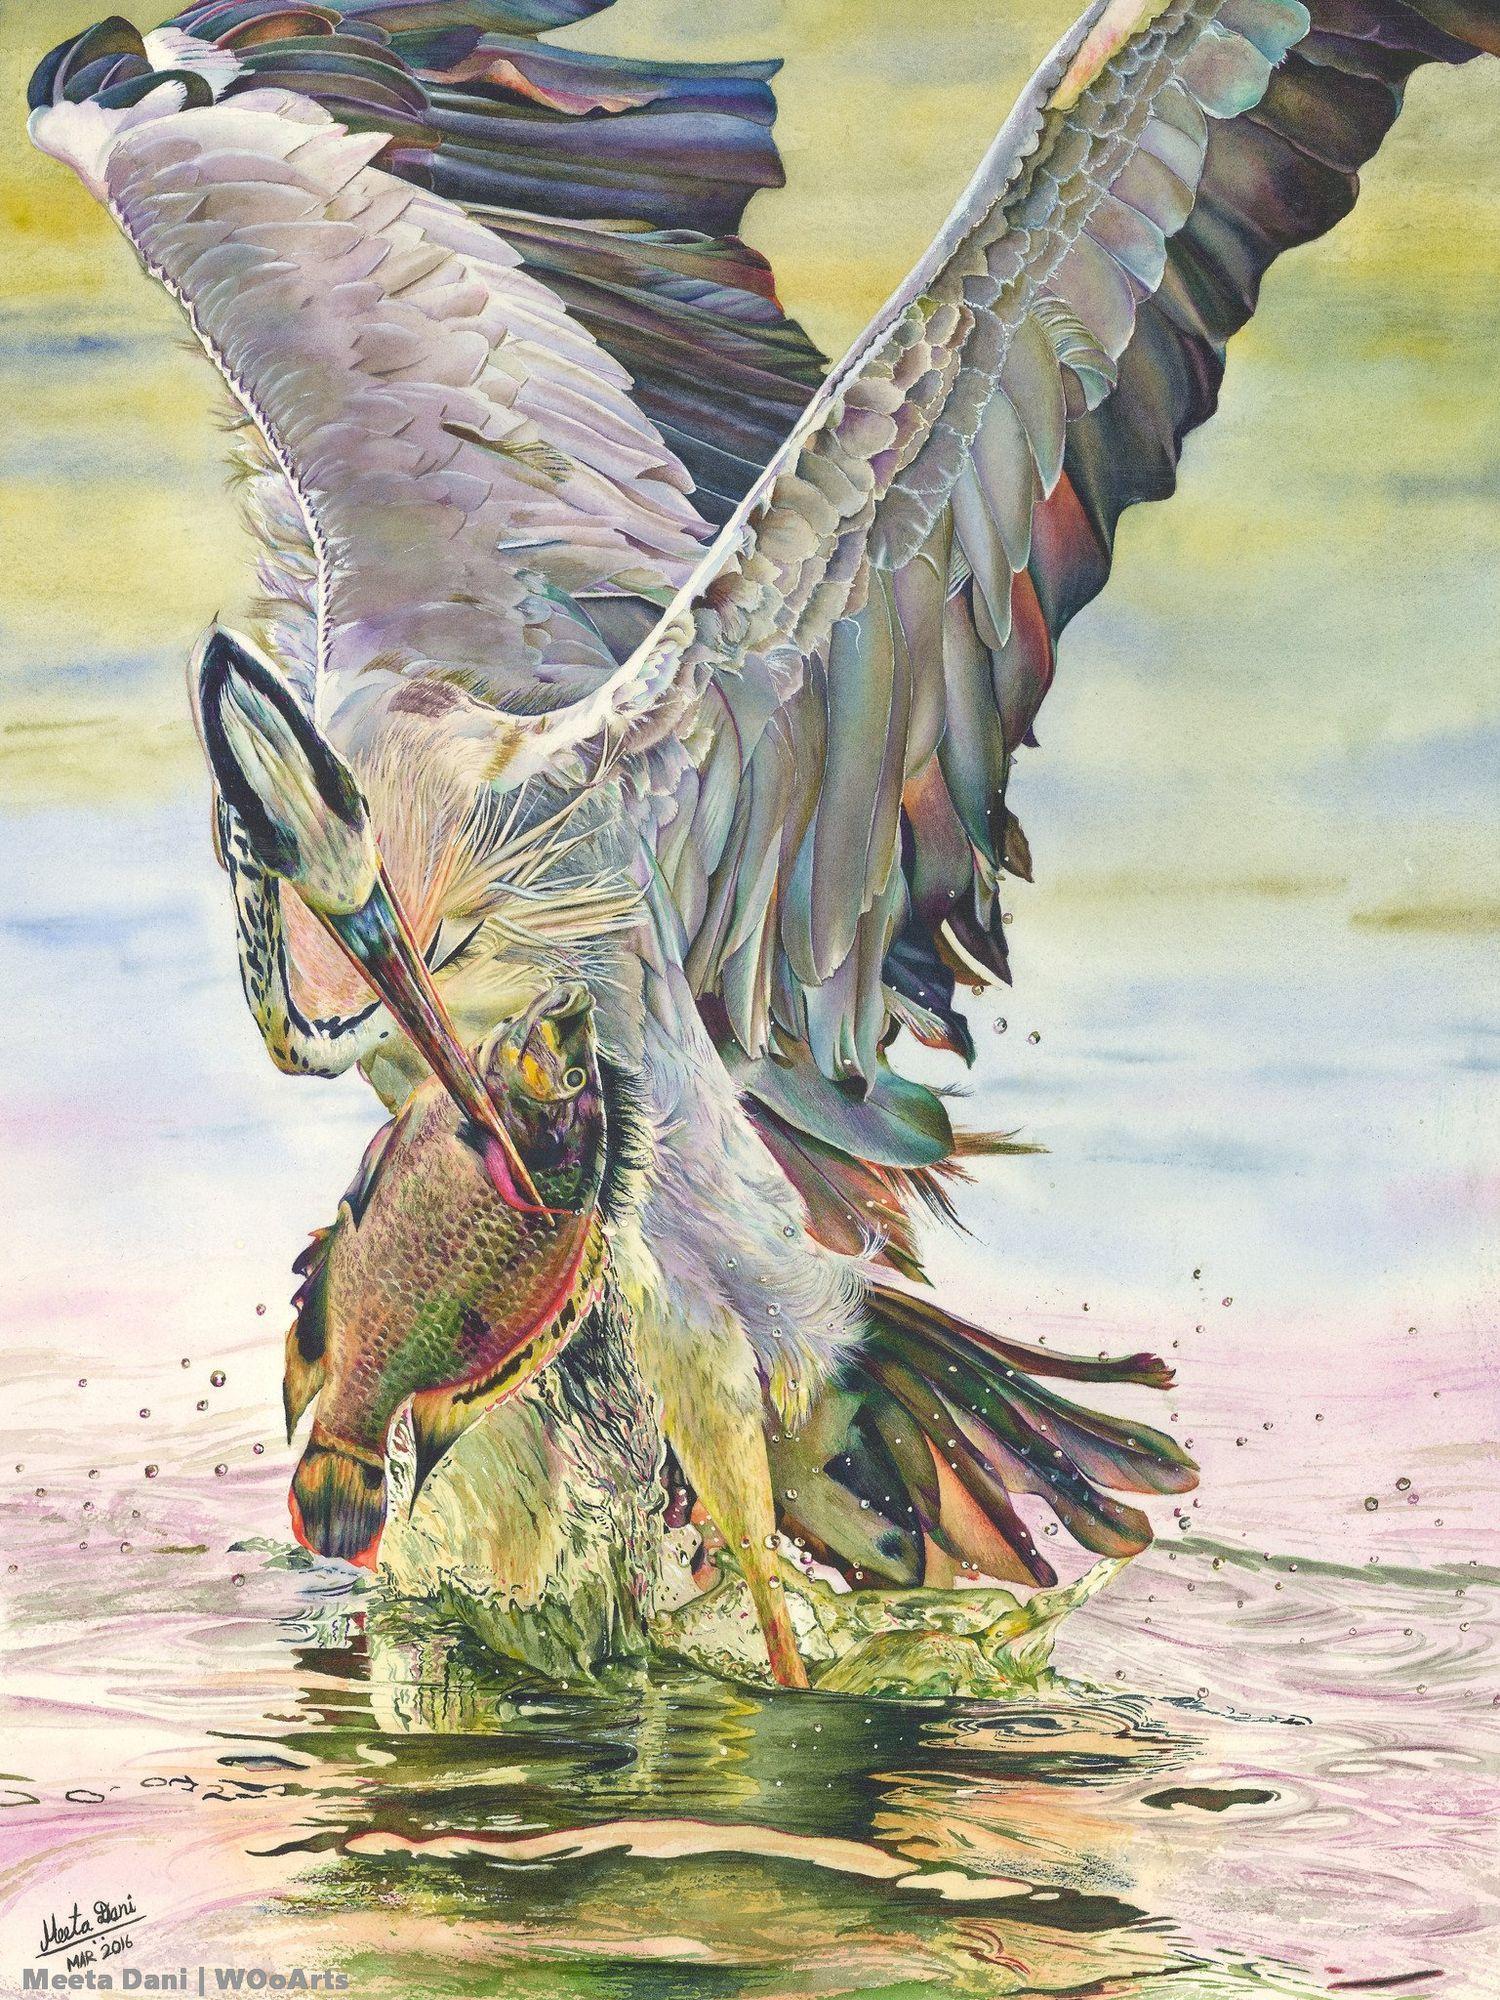 Meeta Dani Paintings Wooarts 11 Photorealism Watercolor Art